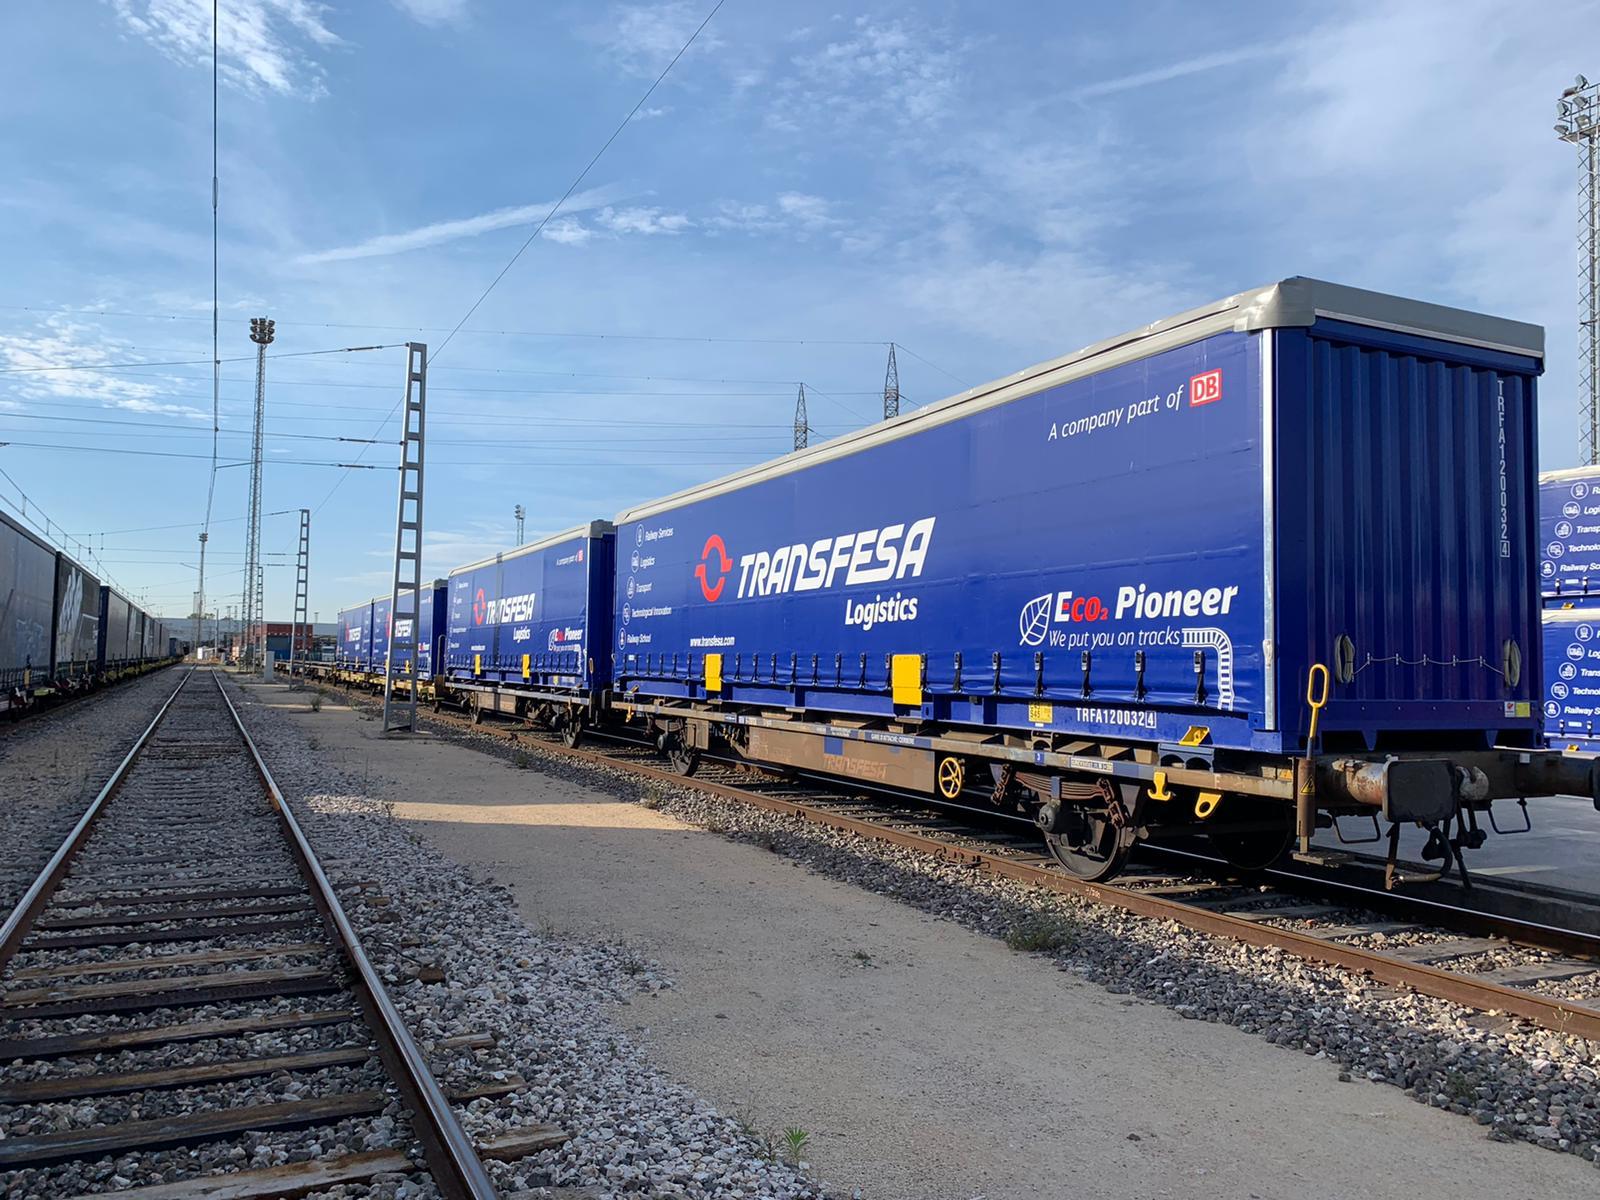 Transfesa Logistics freight container